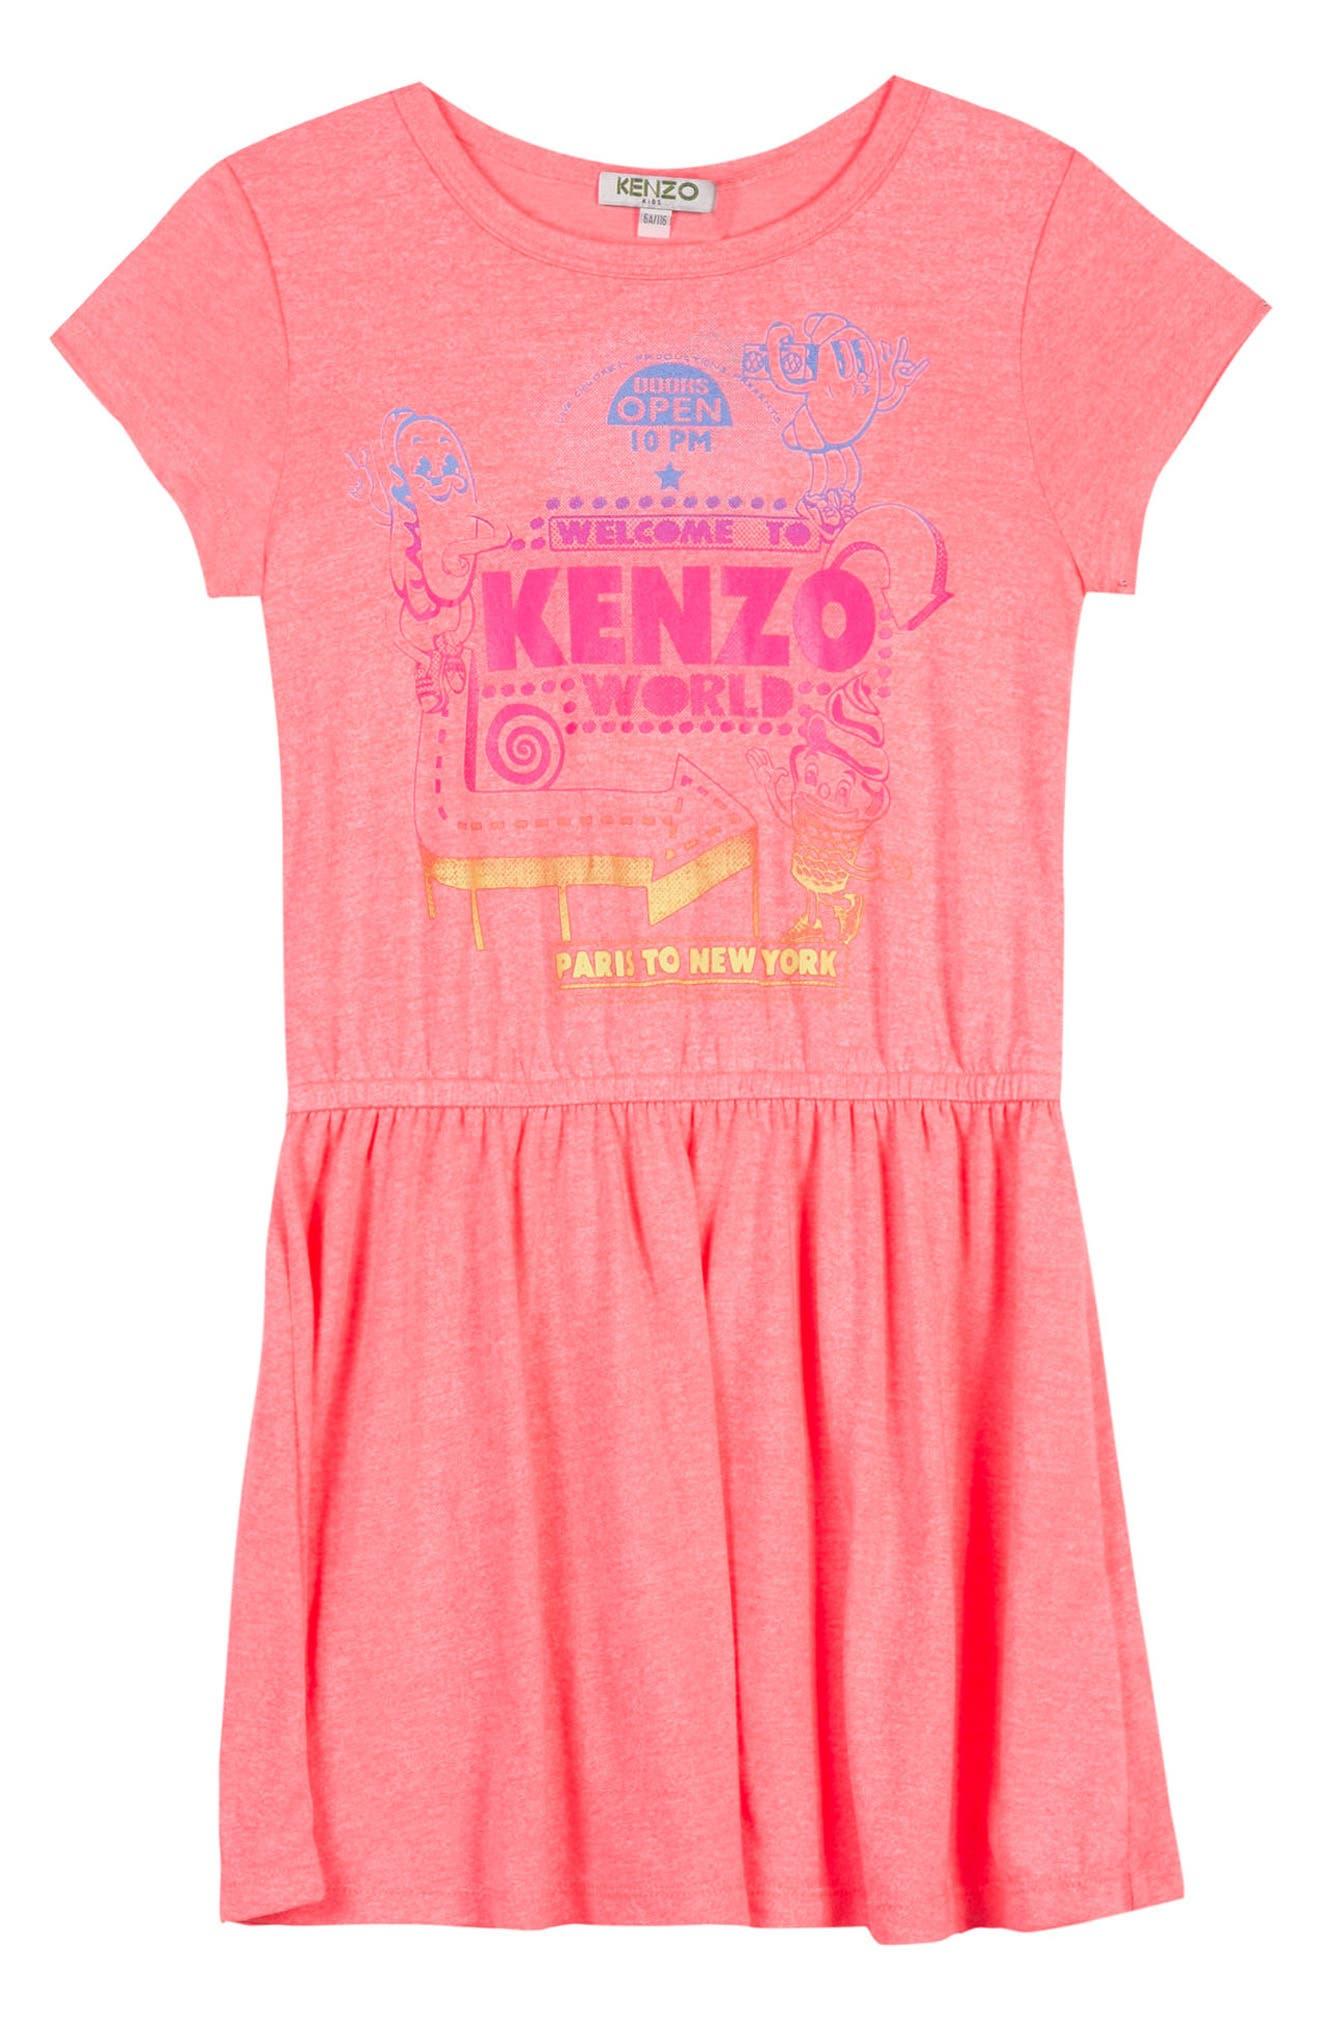 KENZO,                             Logo Skater Dress,                             Main thumbnail 1, color,                             950